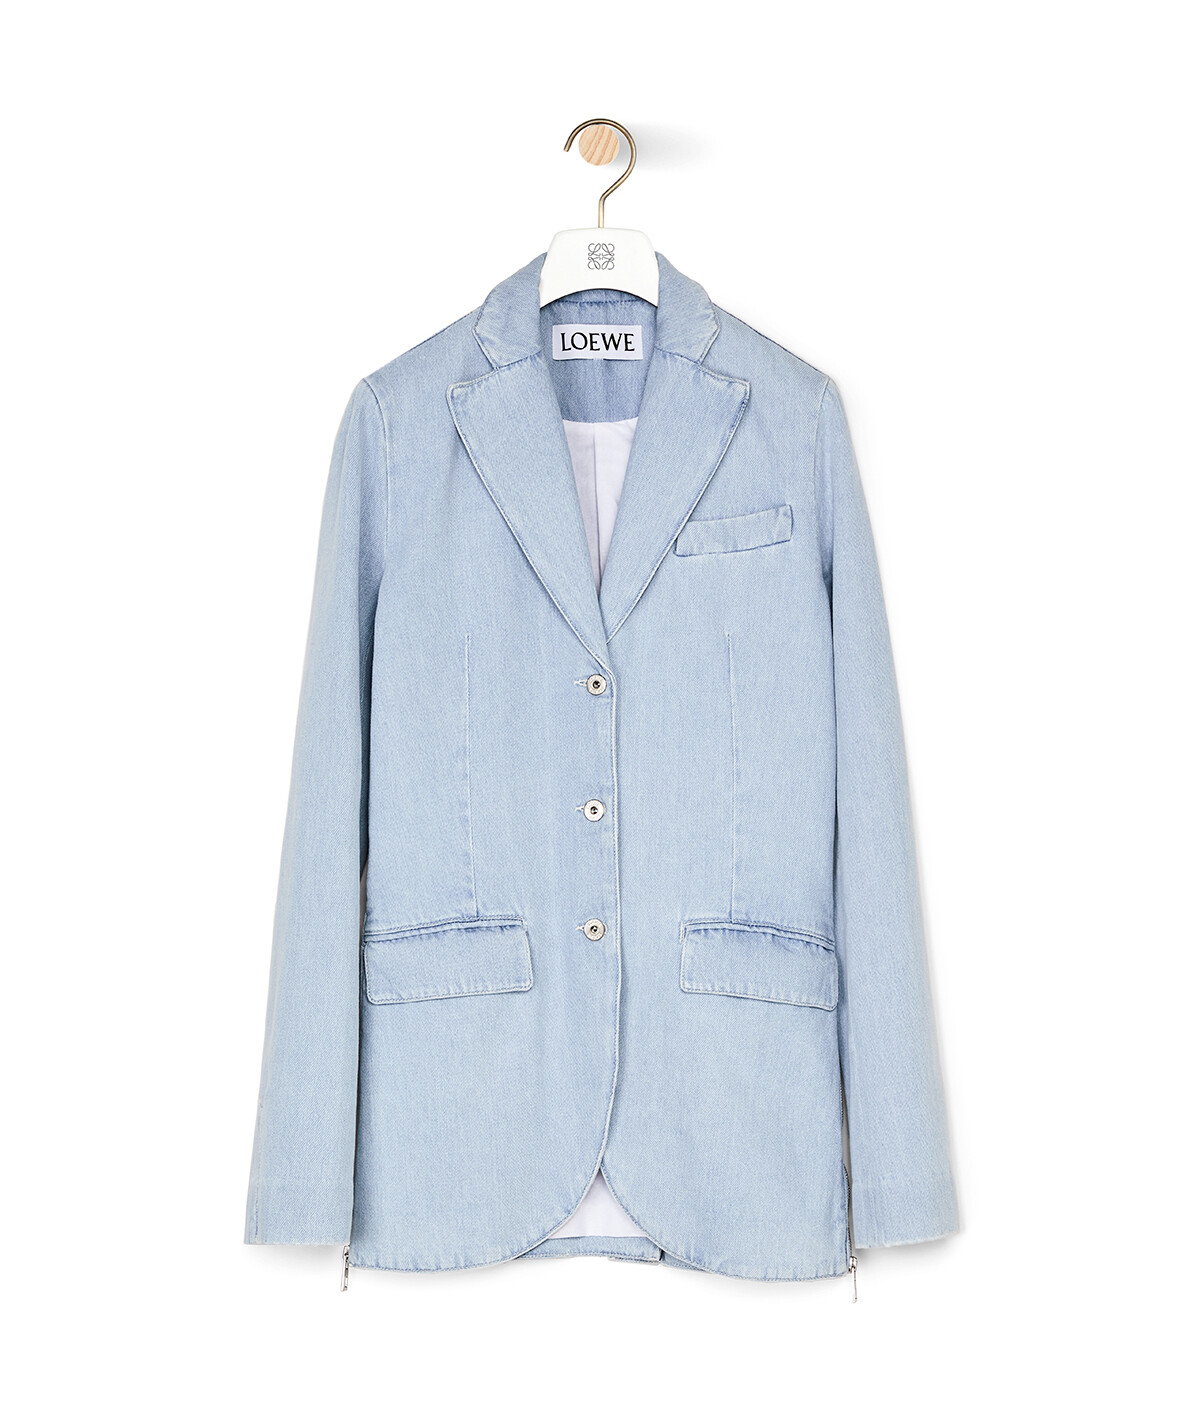 LOEWE 3Bt Notch Lapel Denim Jacket Azul Claro/Blanco front